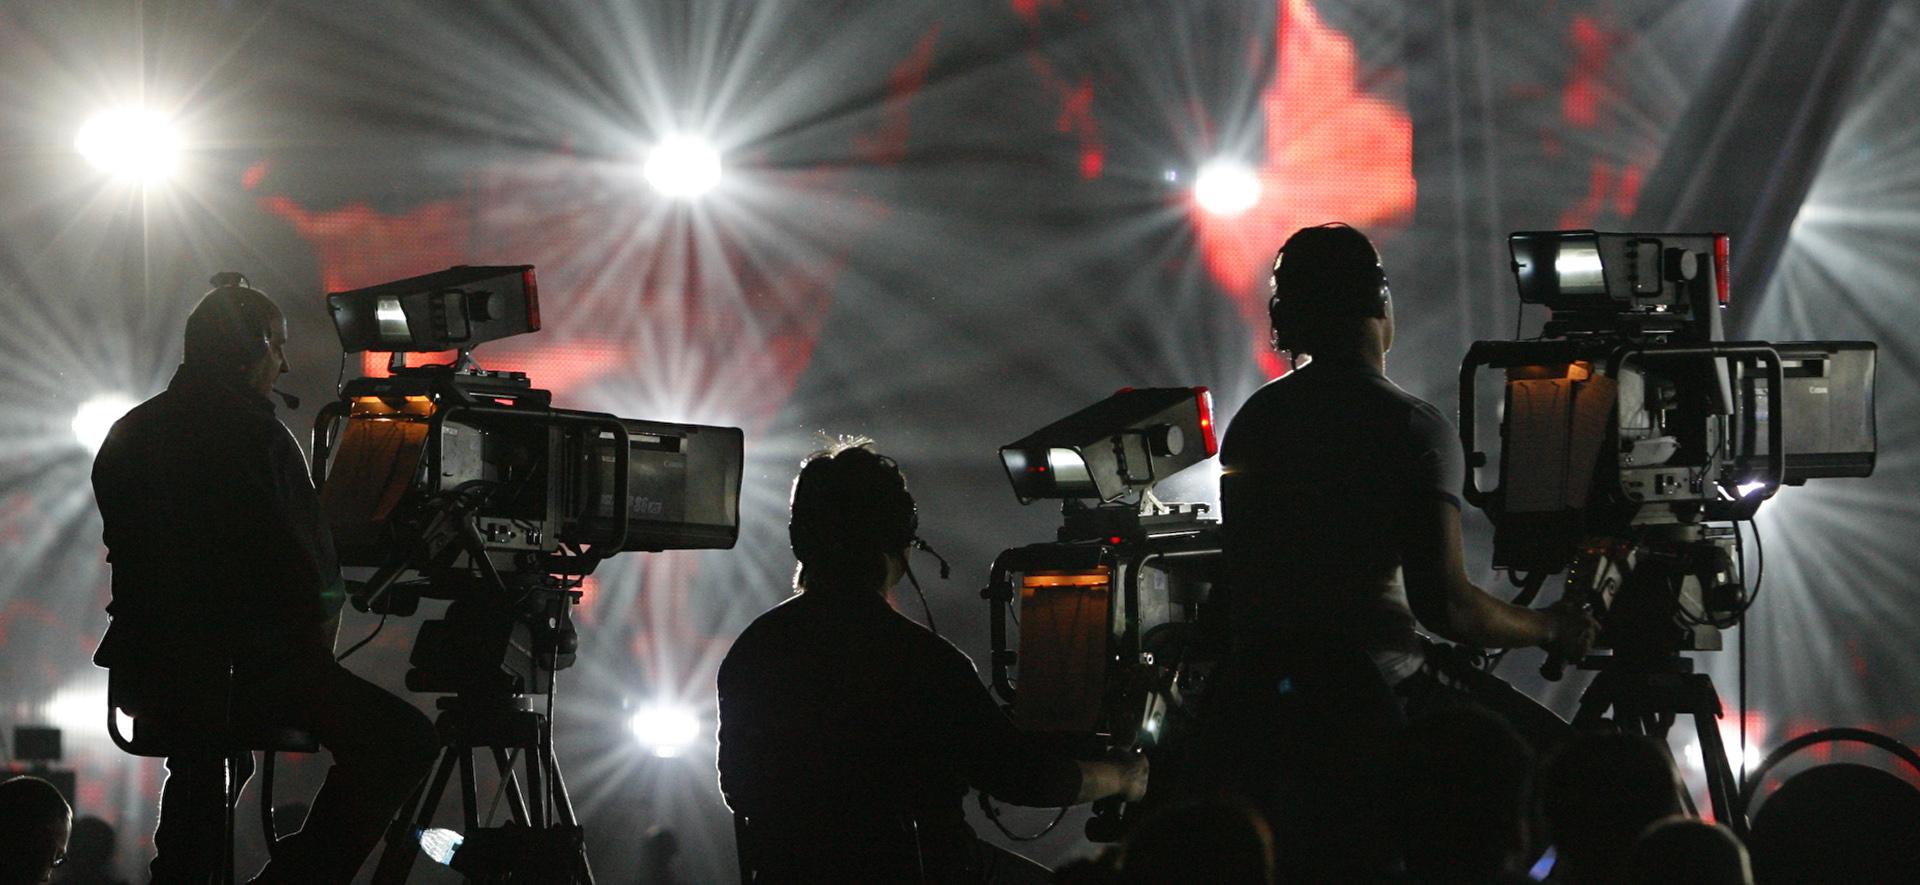 Find Actors, Models, Dancers, Production Crew